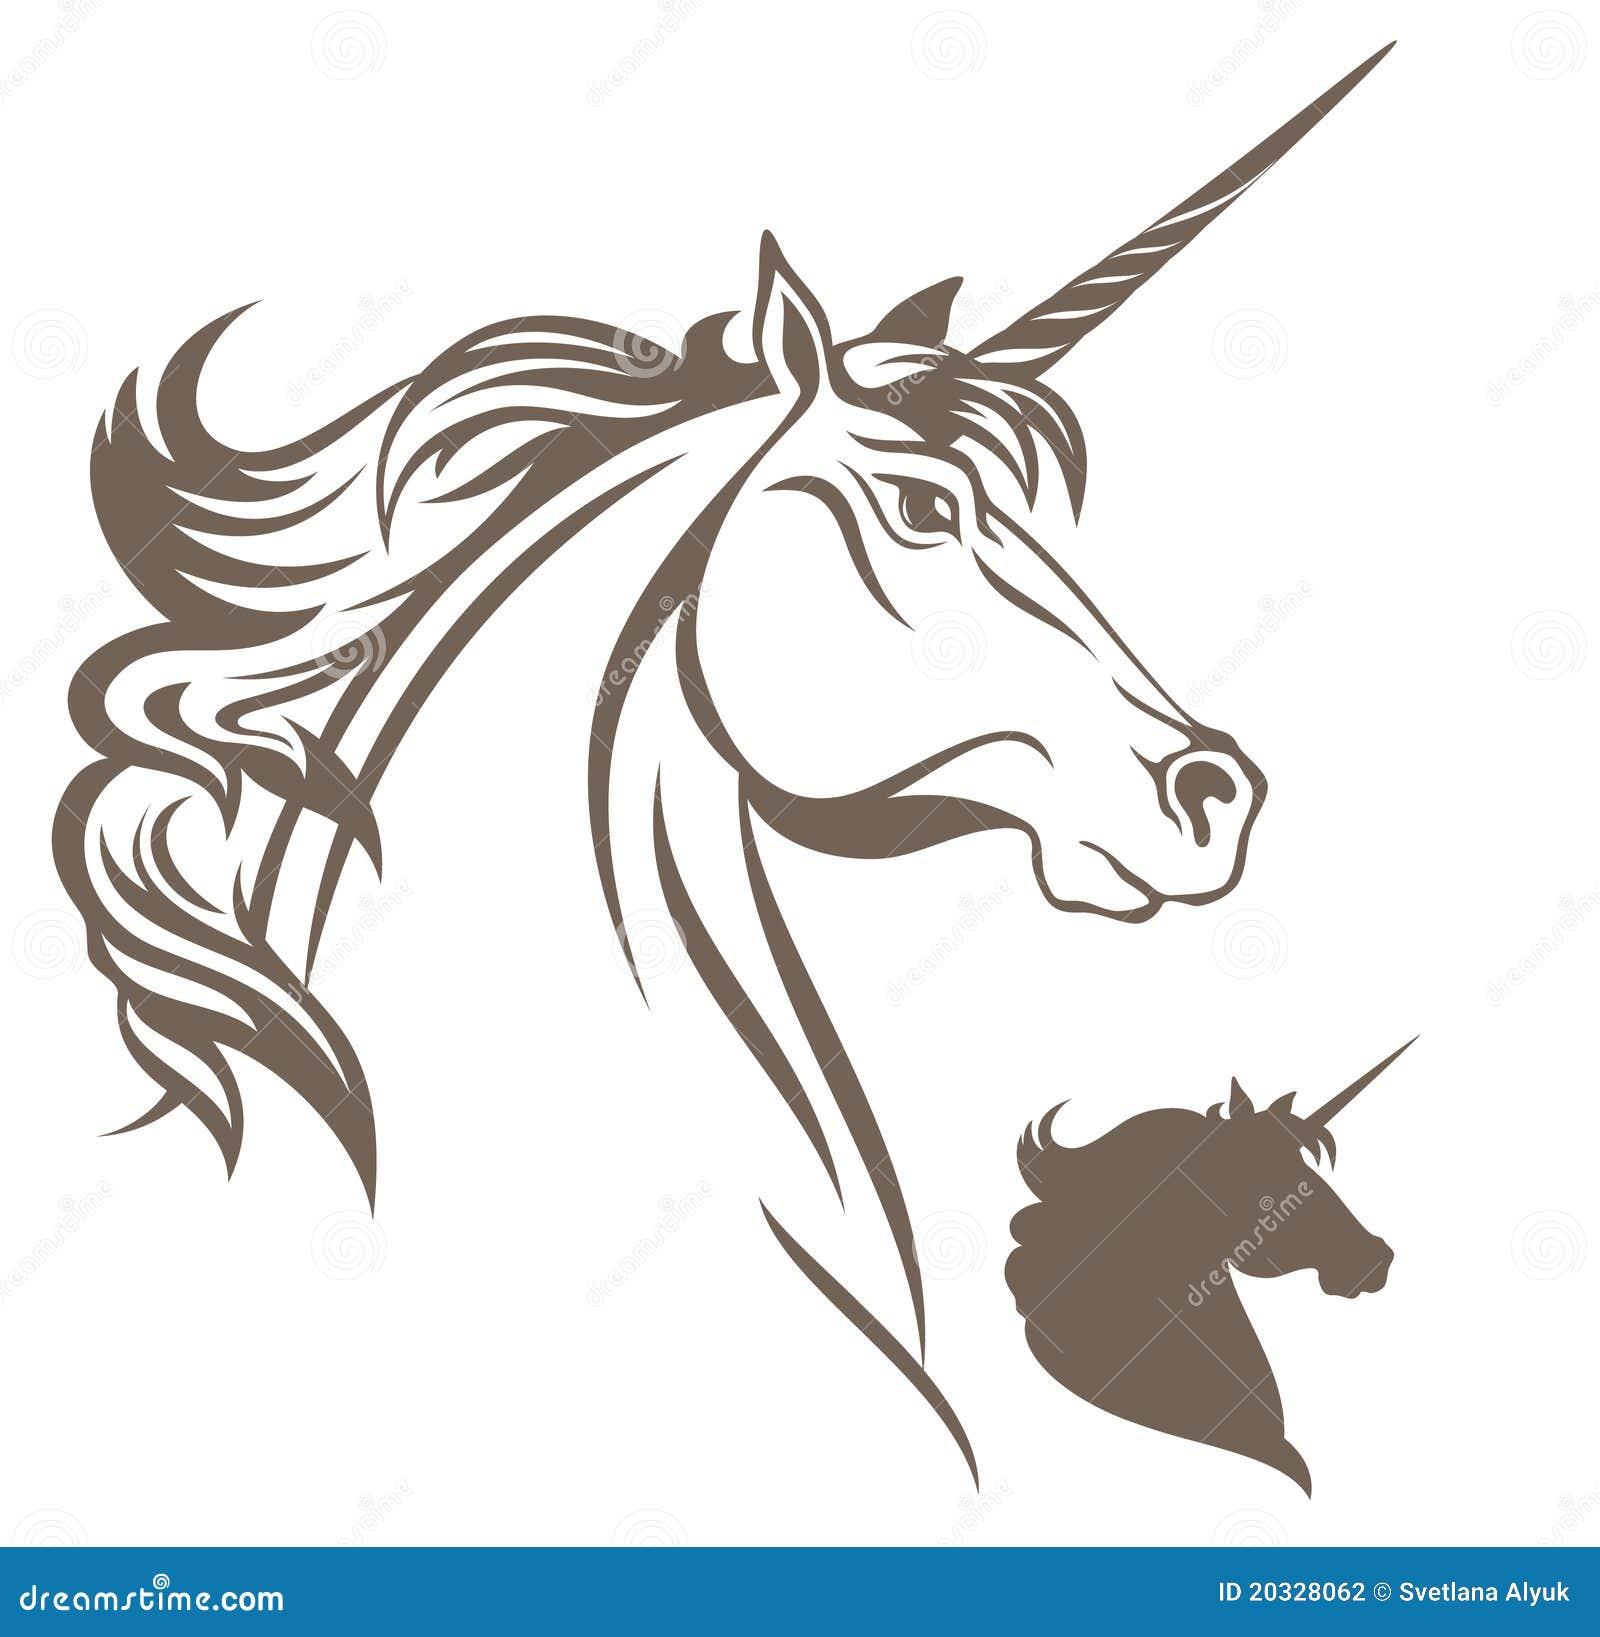 Unicorn Vector Stock Photography - Image: 20328062